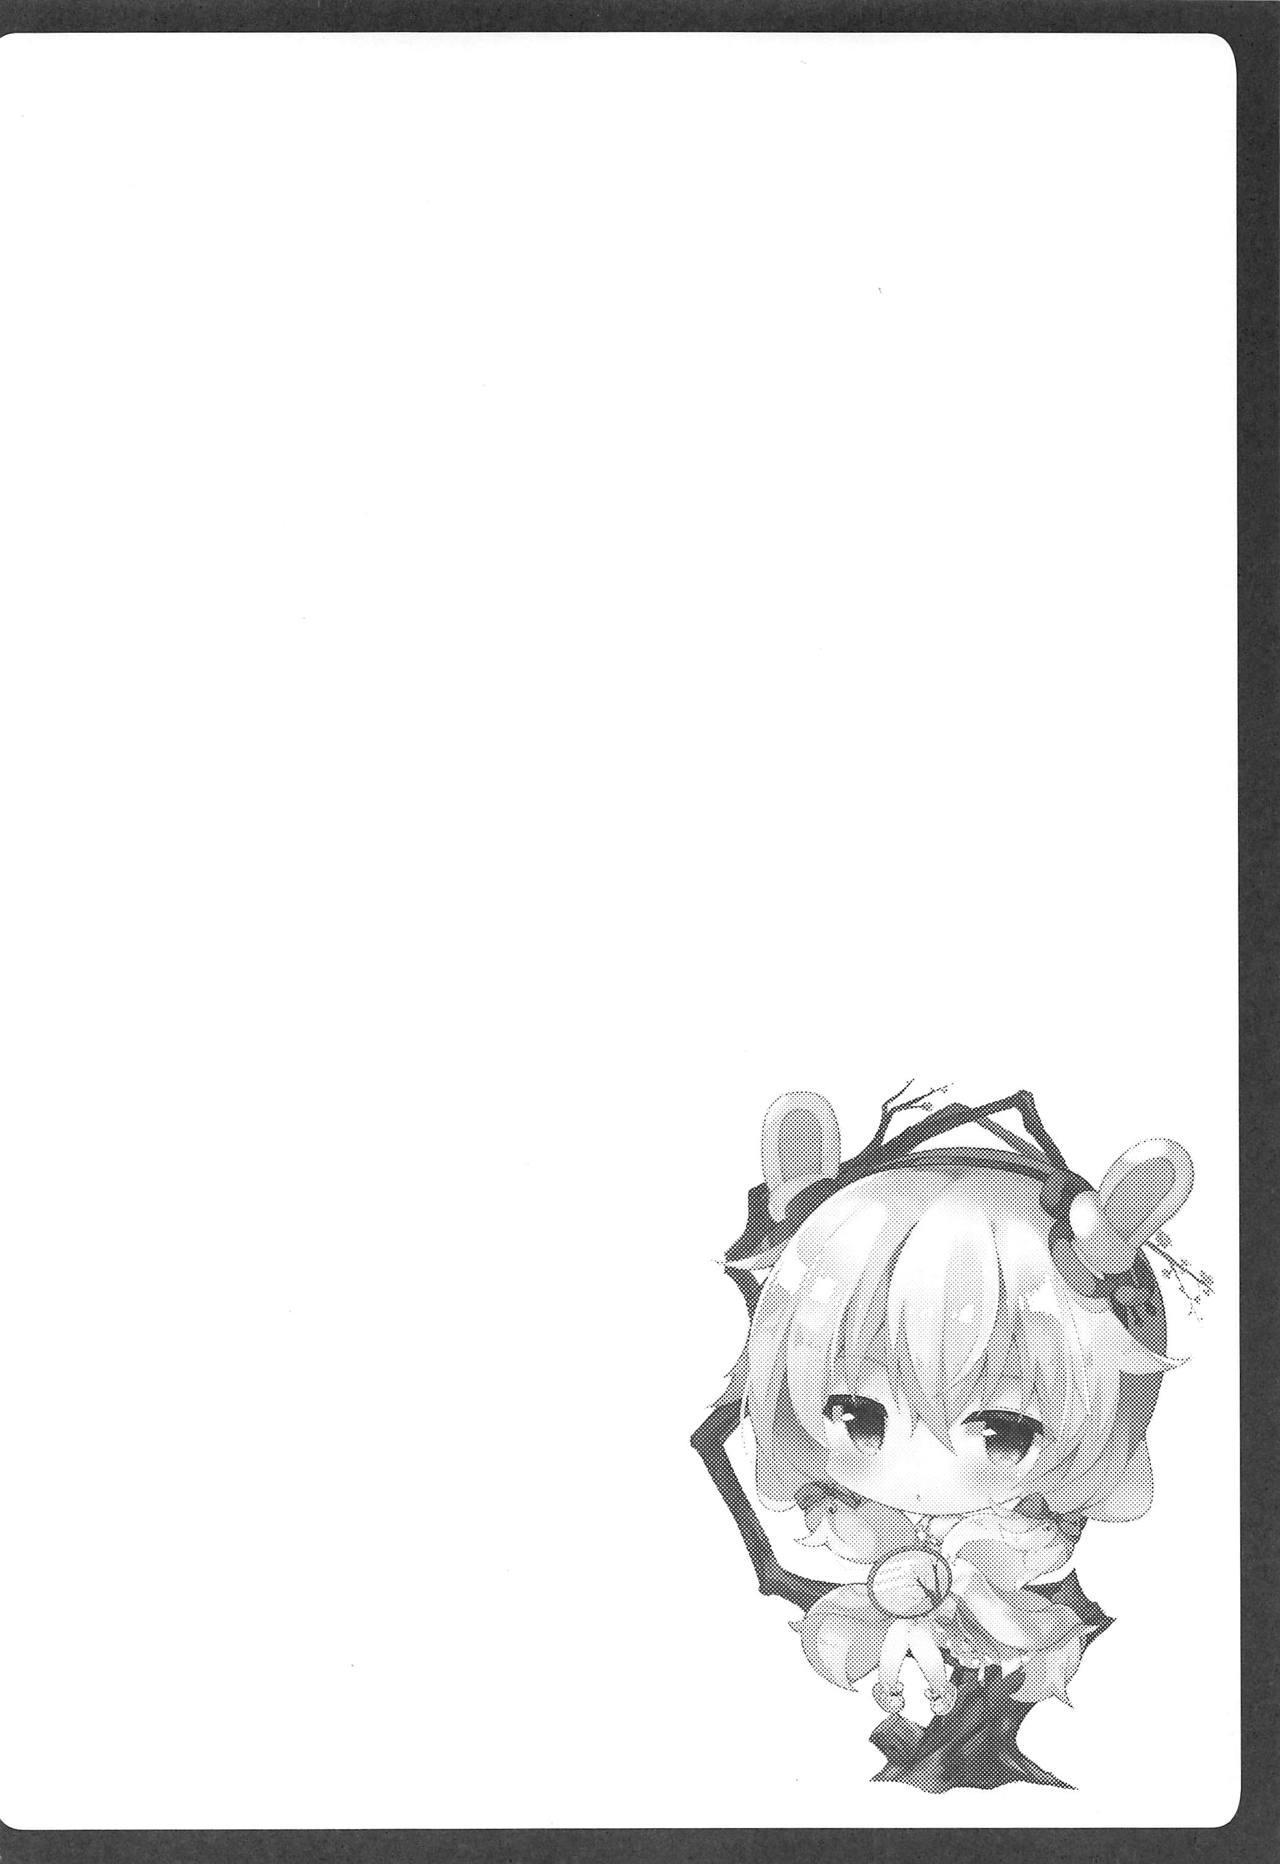 (COMIC1☆15) [Funa Time (Yukina Funa)] Laffey-chan no Hatsujouki... - Estrus of Laffey (Azur Lane) 2